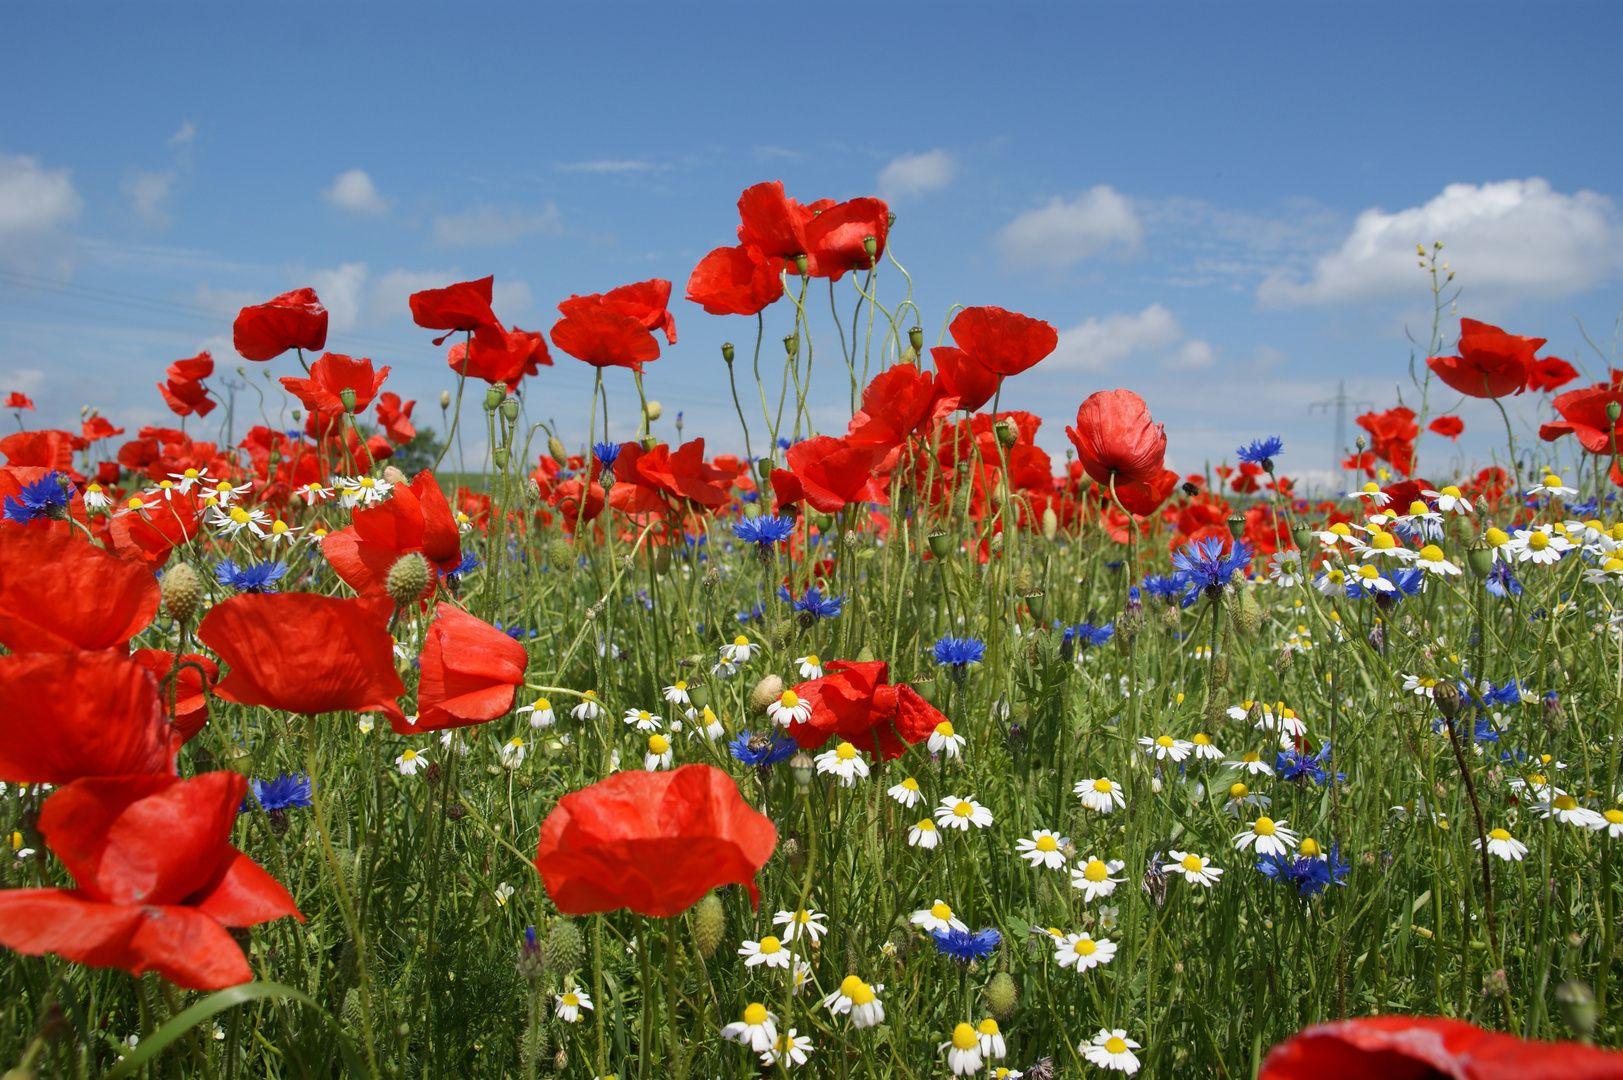 Mohnblumen Kornblumen Und Kamille Mohnblume Blumen Gemalde Mohn